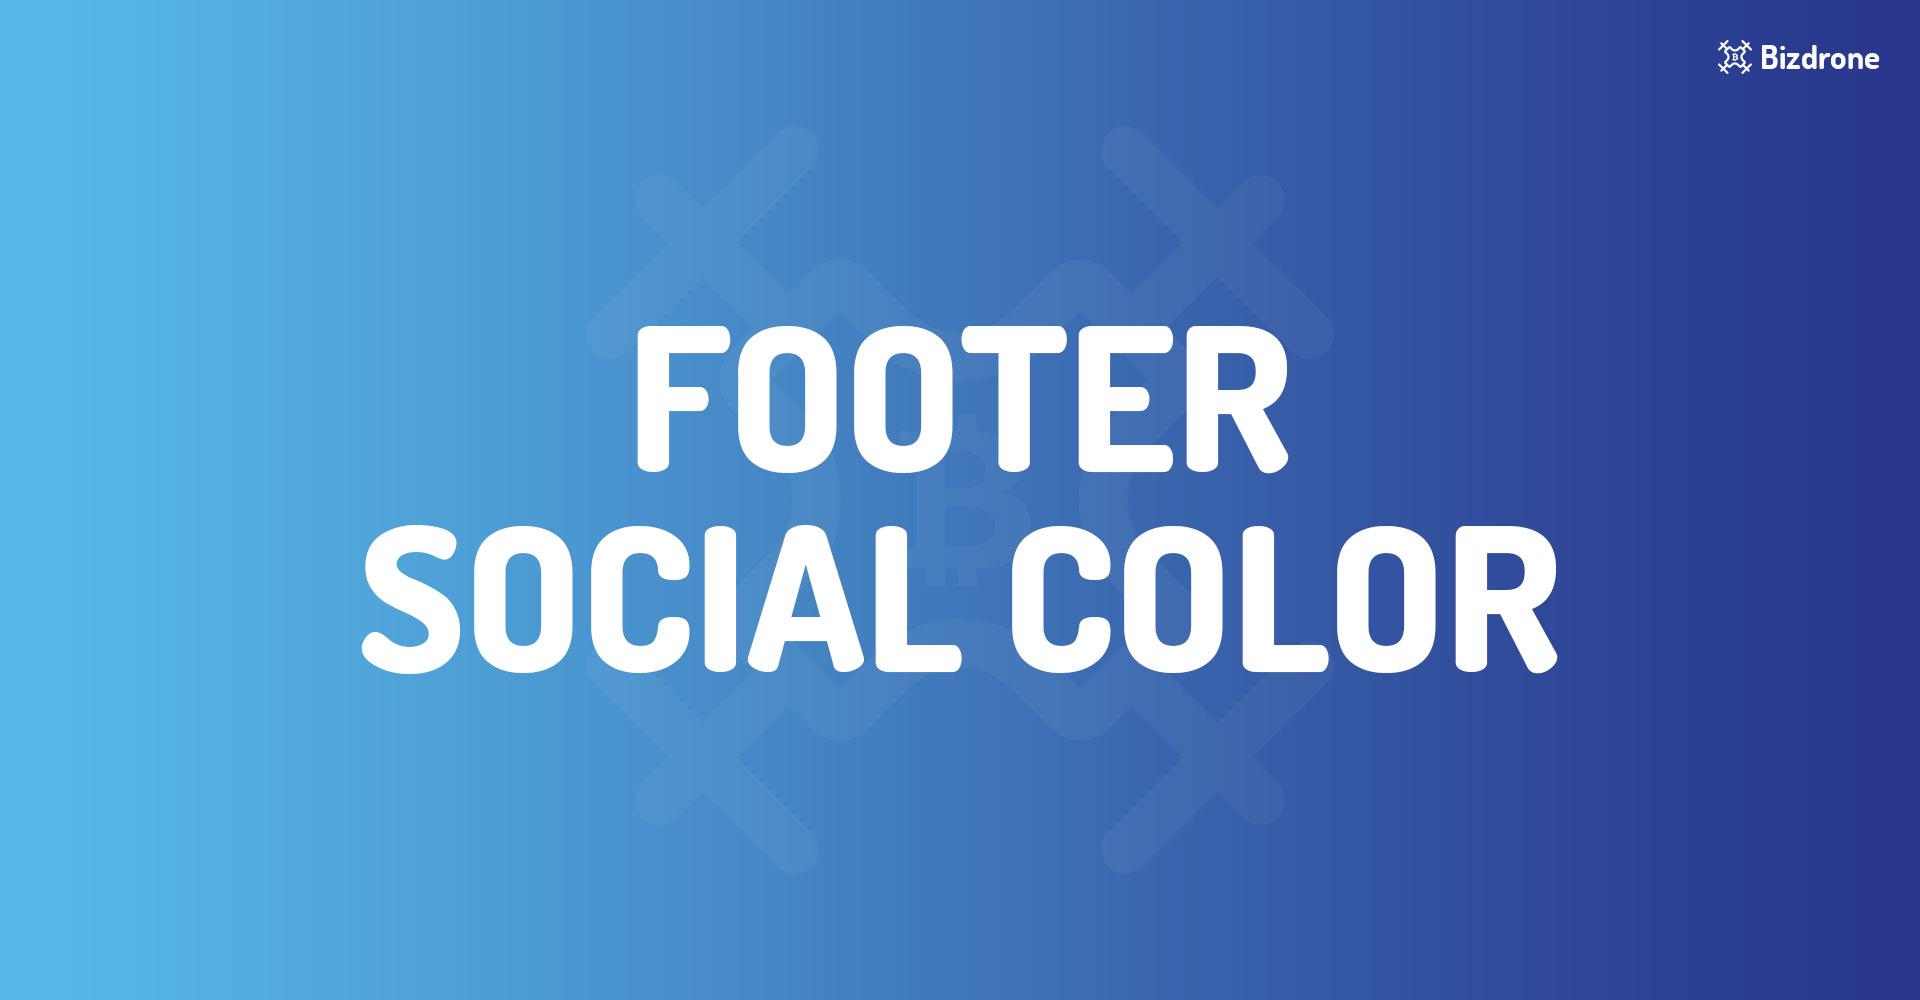 Footer Social color